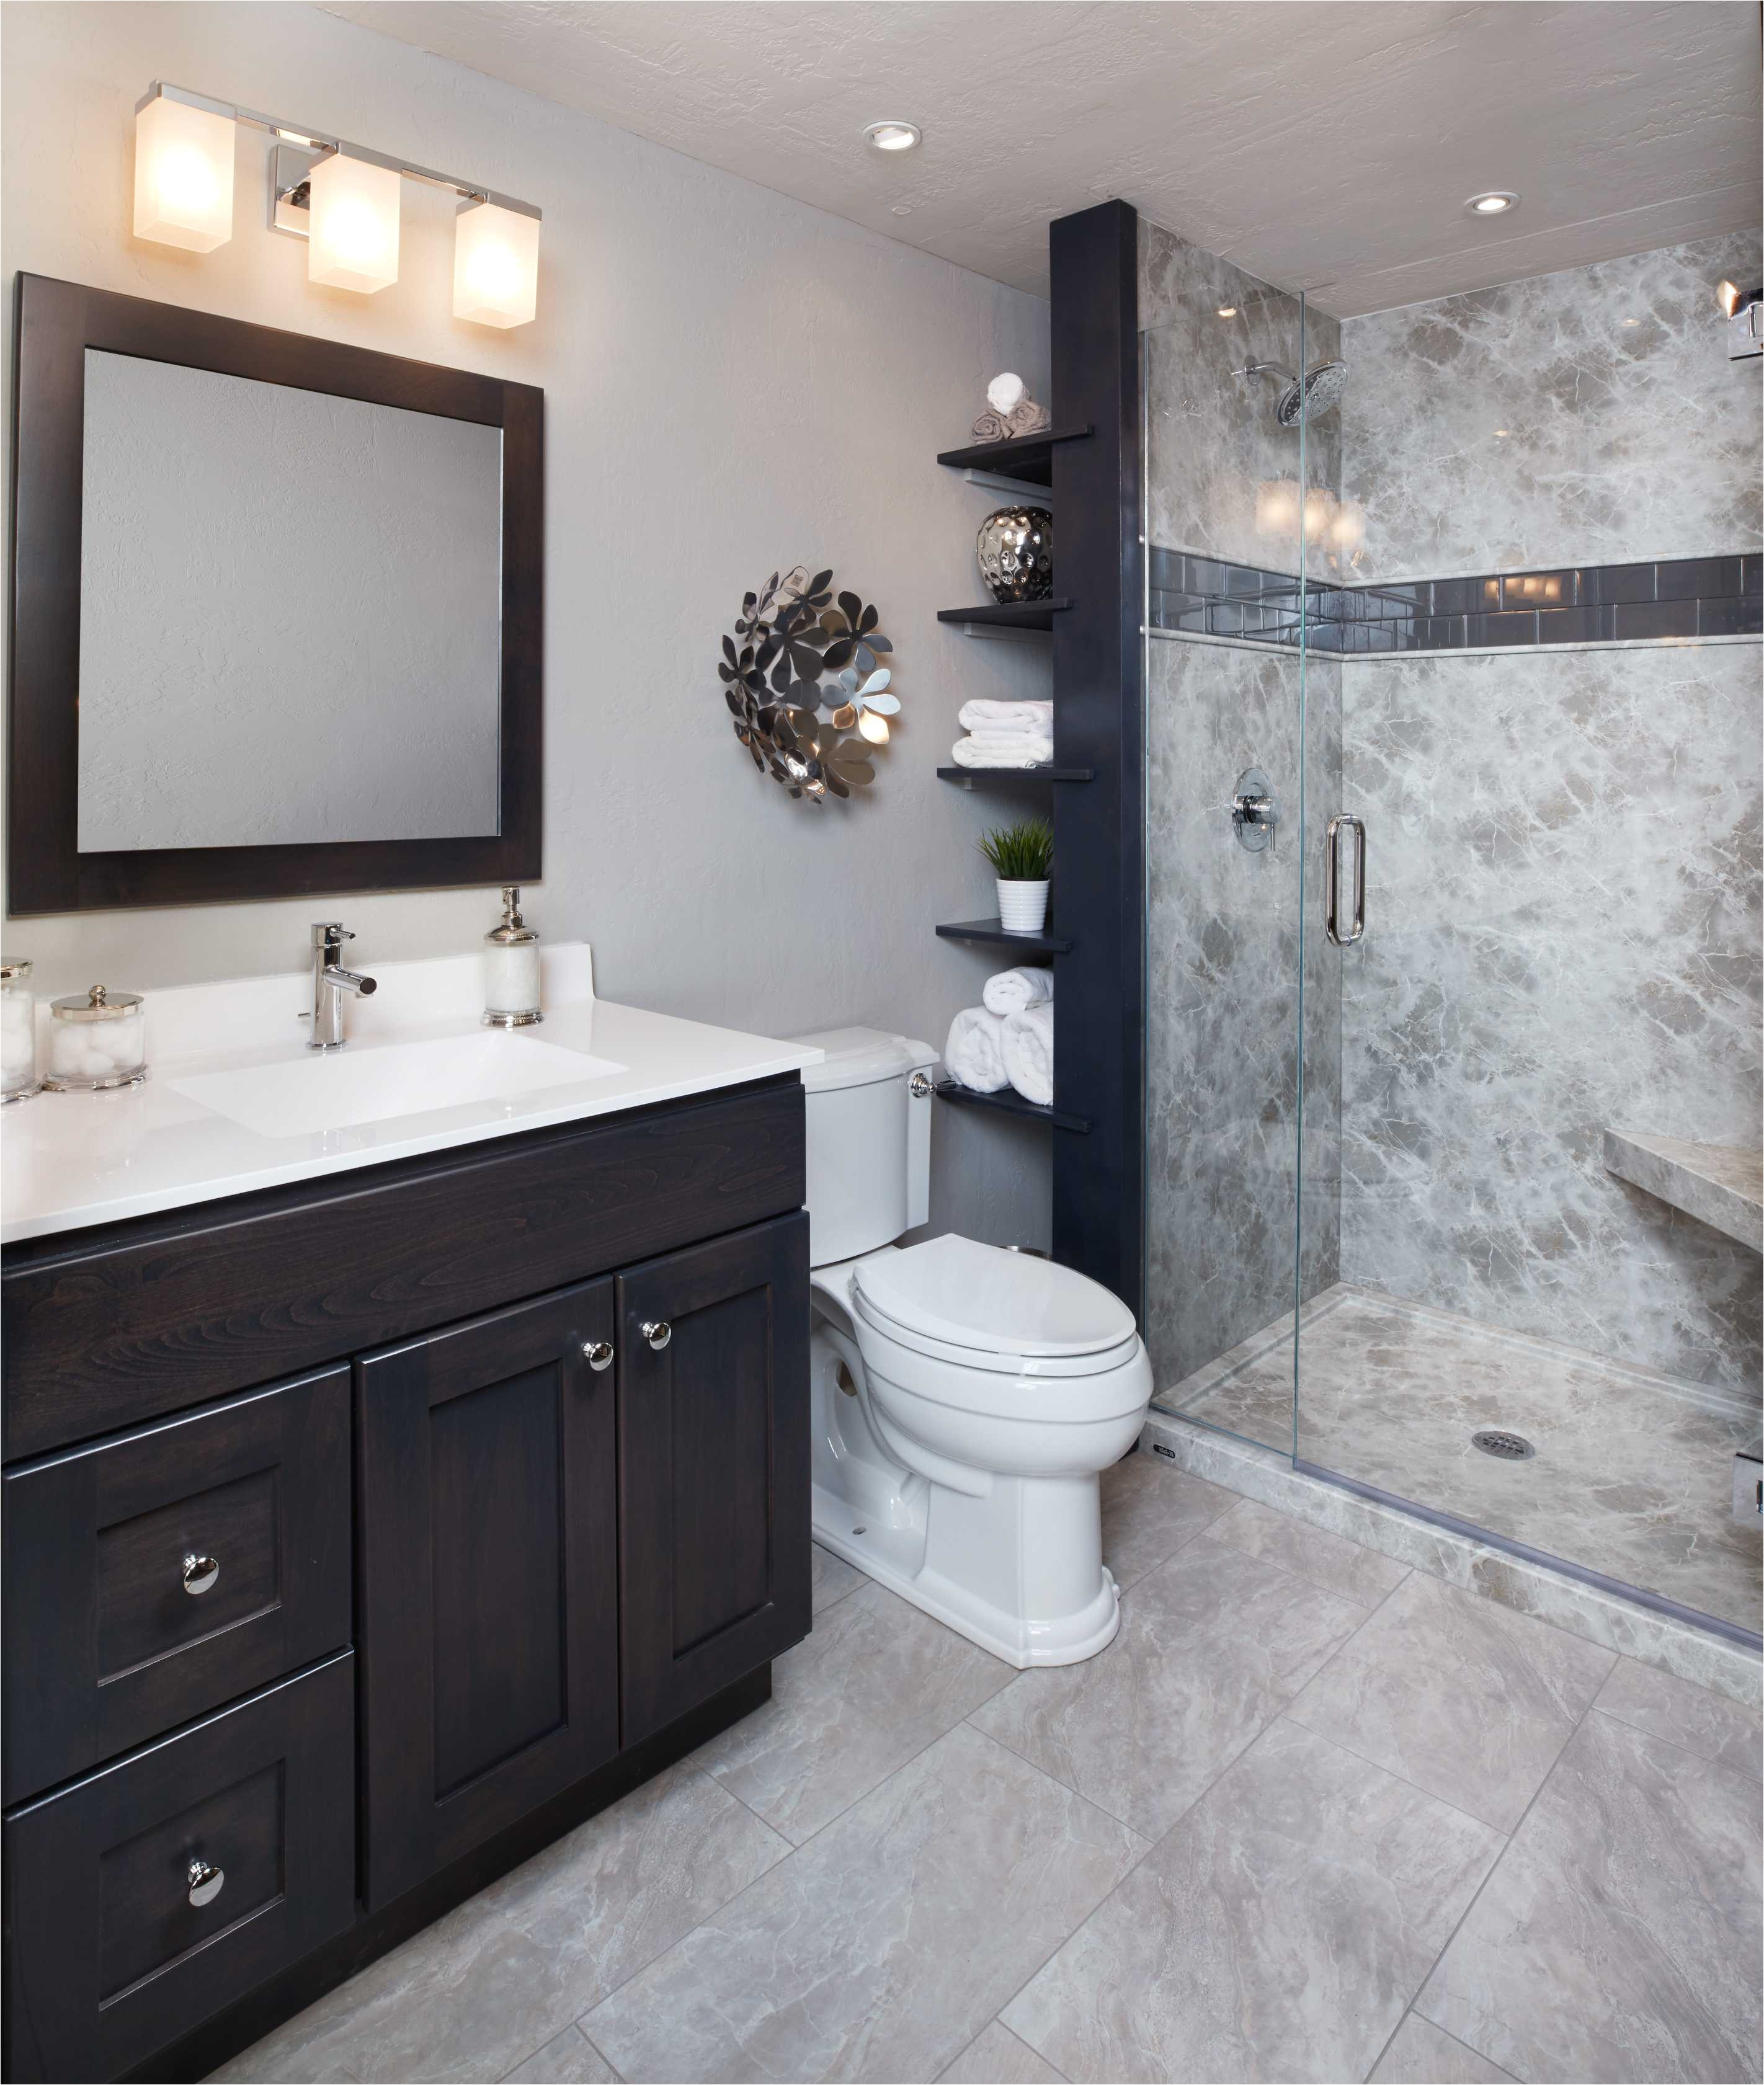 bathtub overlay awesome bathroom bathfitters prices bathtub liners lowes